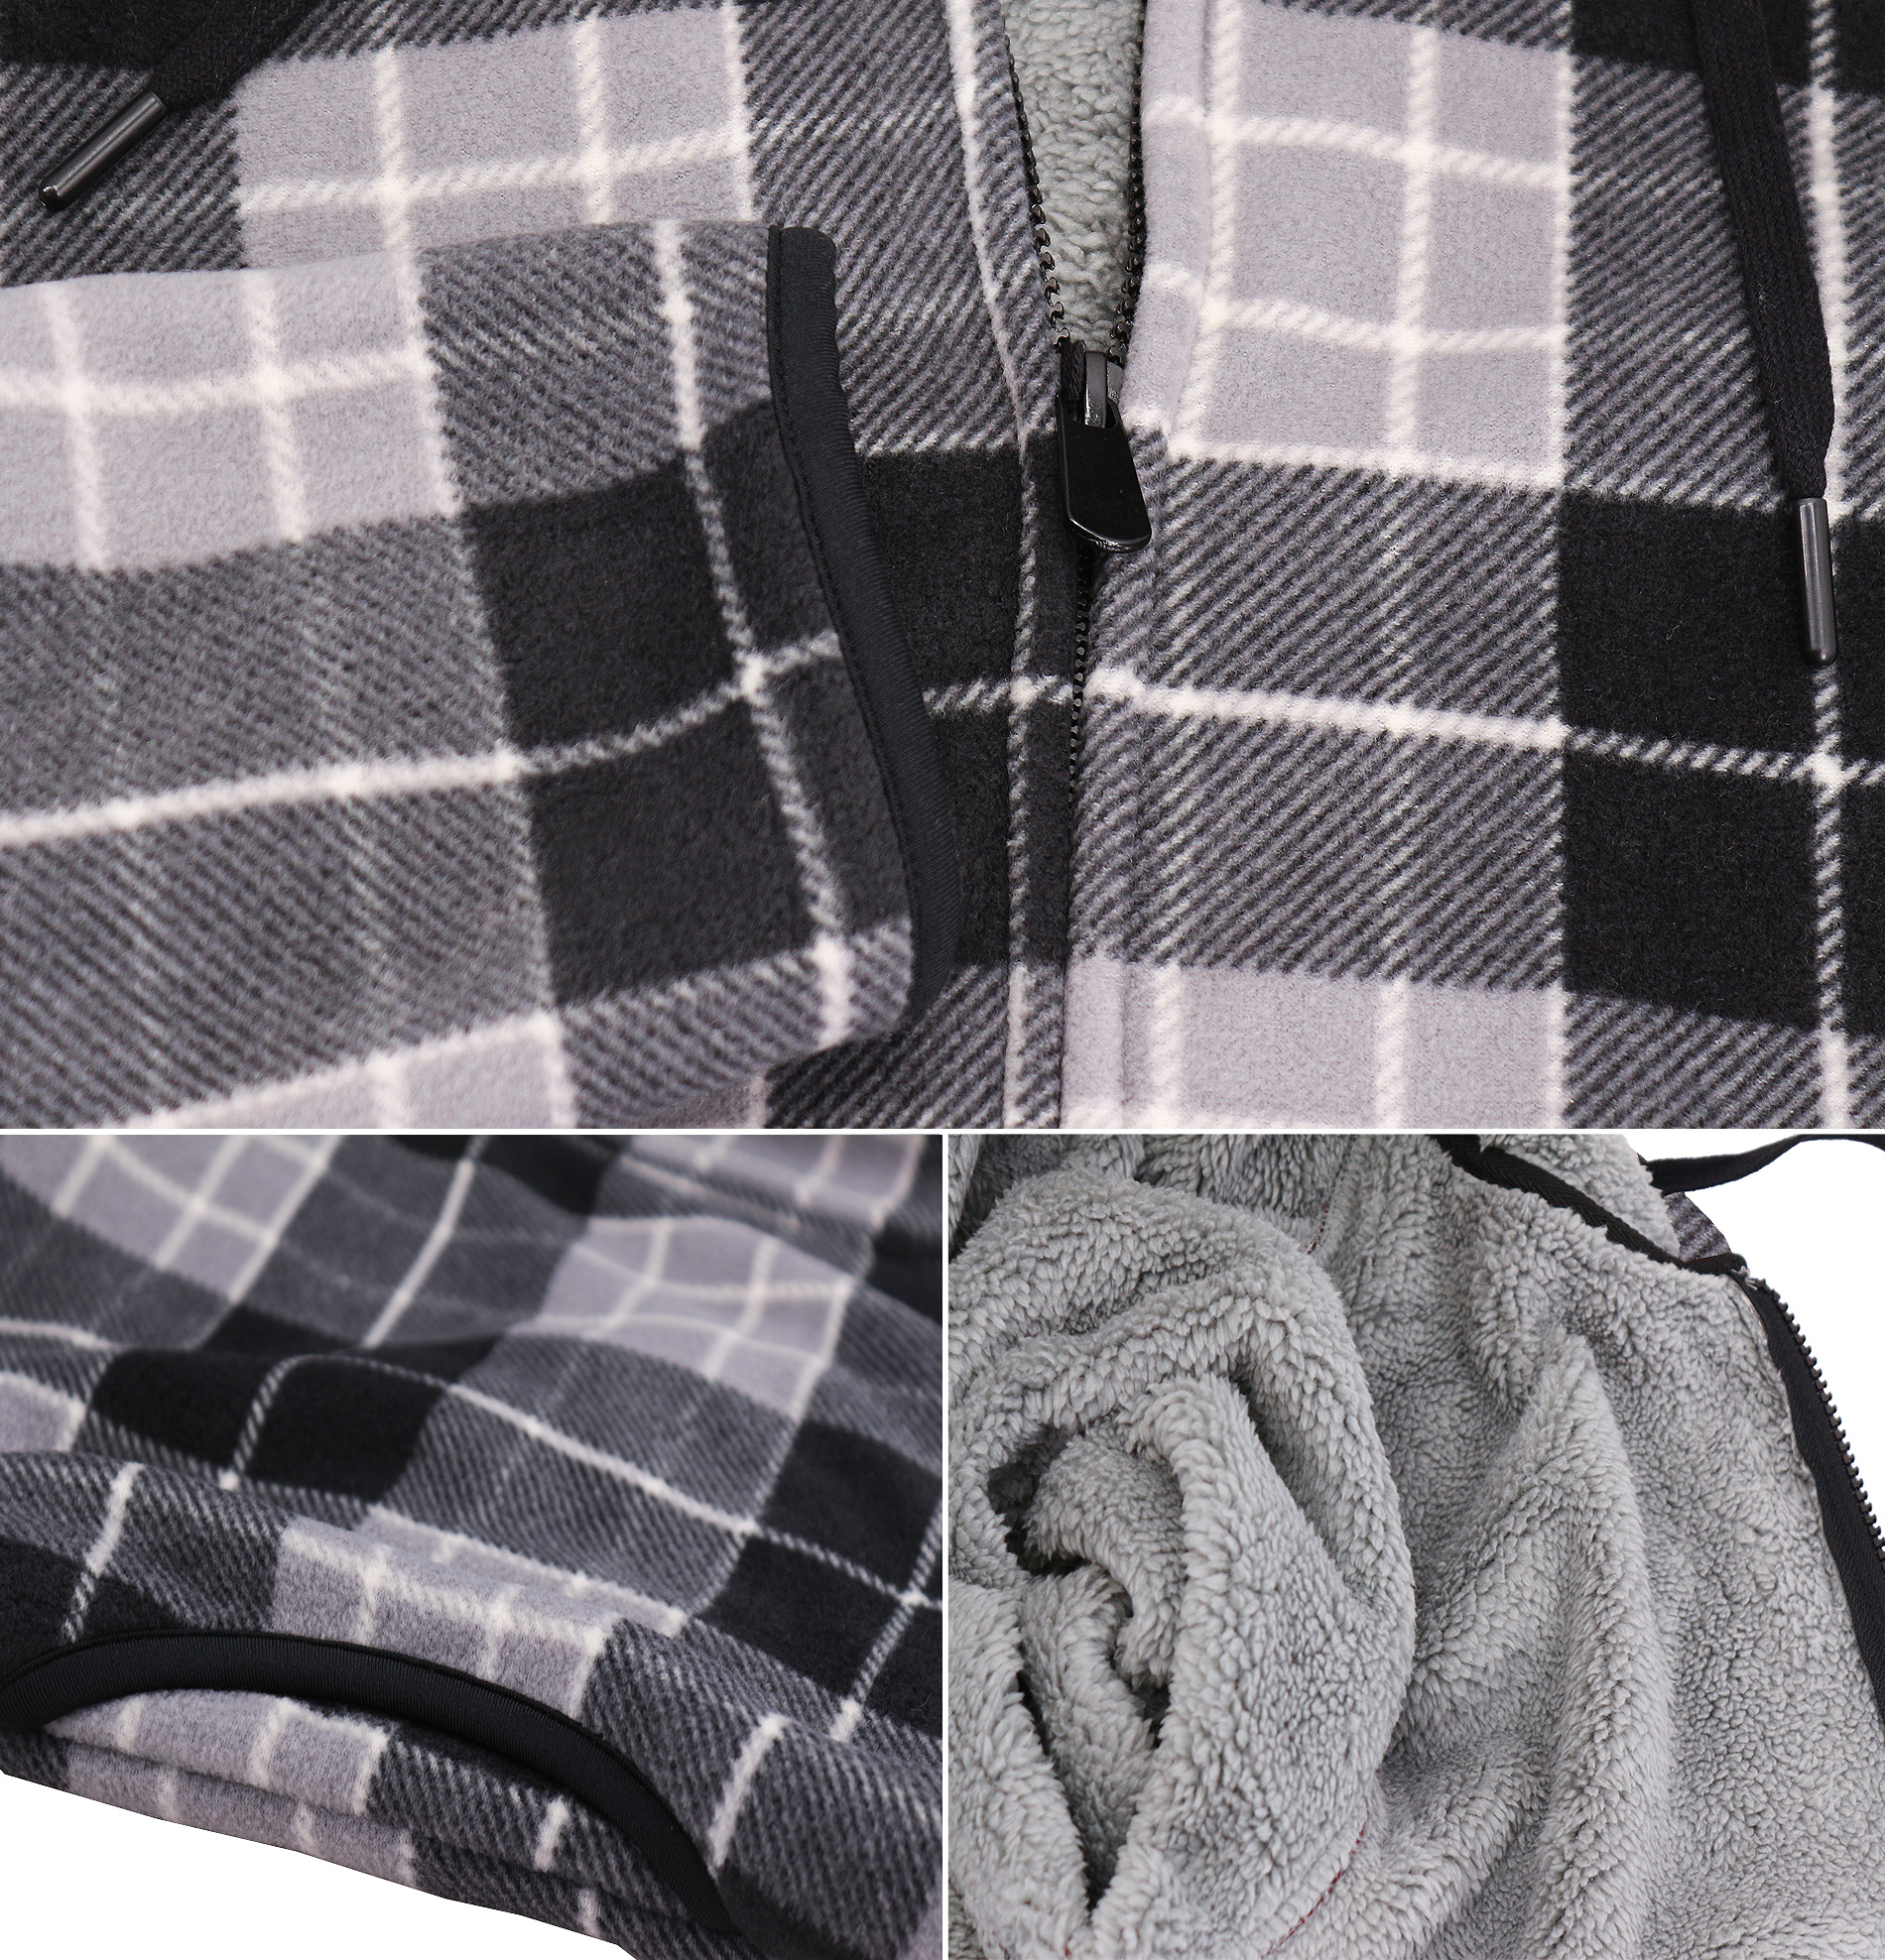 thumbnail 16 - Men-039-s-Casual-Flannel-Zip-Up-Fleece-Lined-Plaid-Sherpa-Hoodie-Lightweight-Jacket